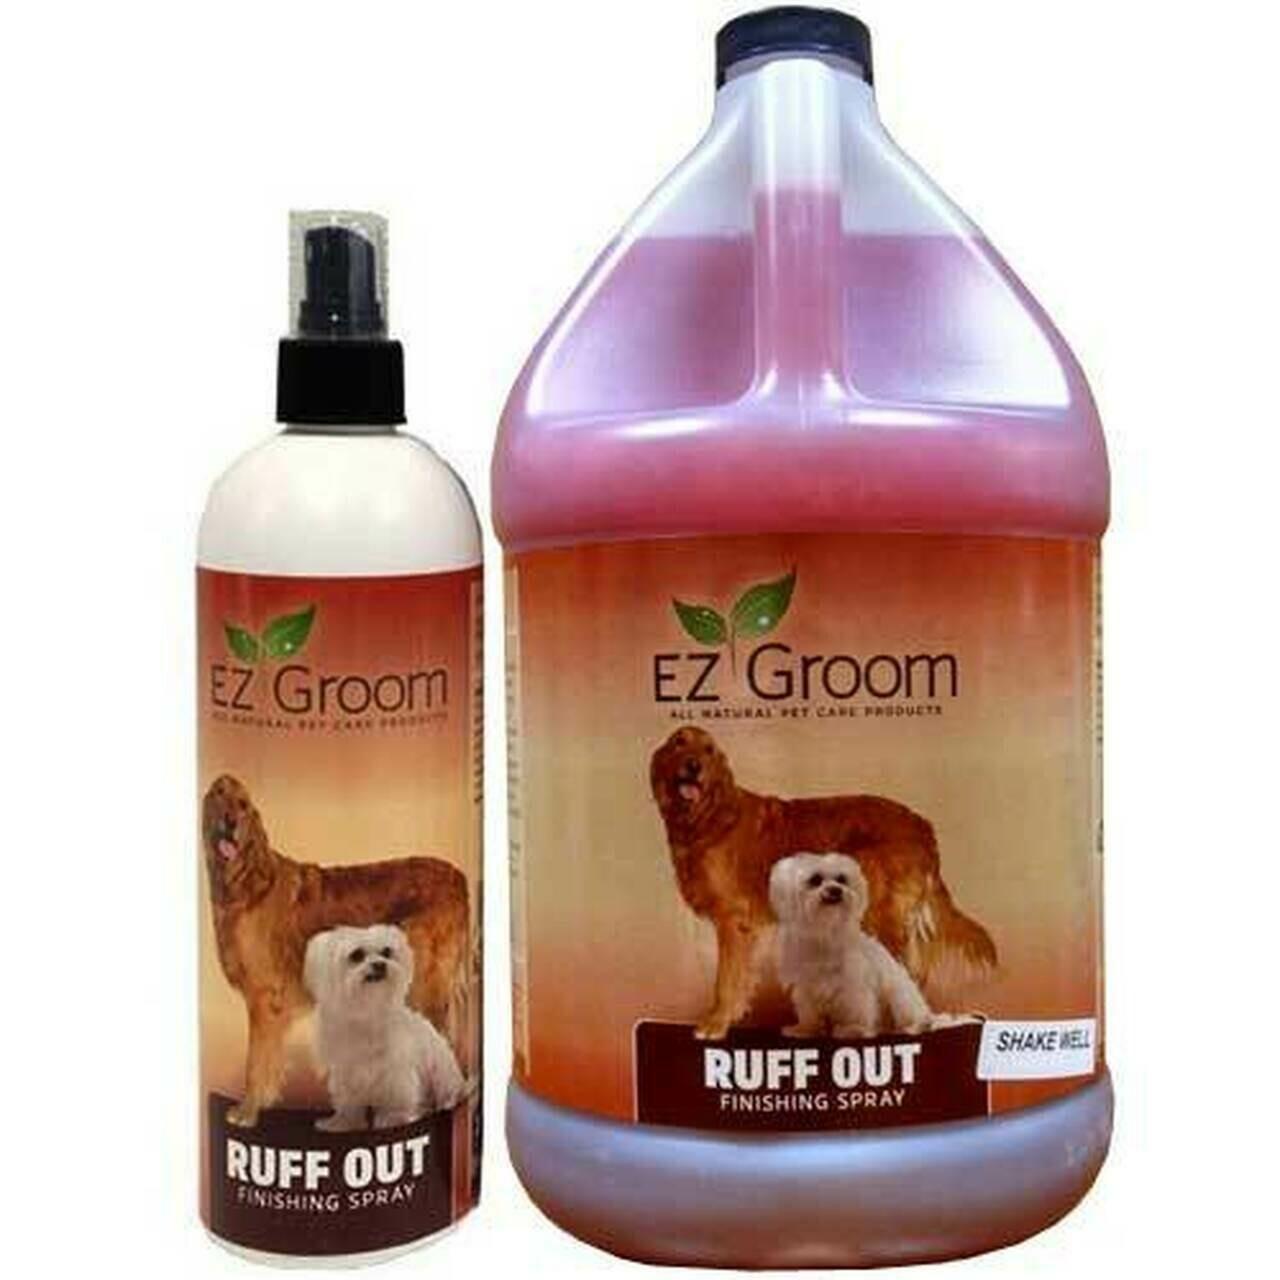 EZ-Groom Ruff Out Finishing Spray несмываемый кондиционер-спрей